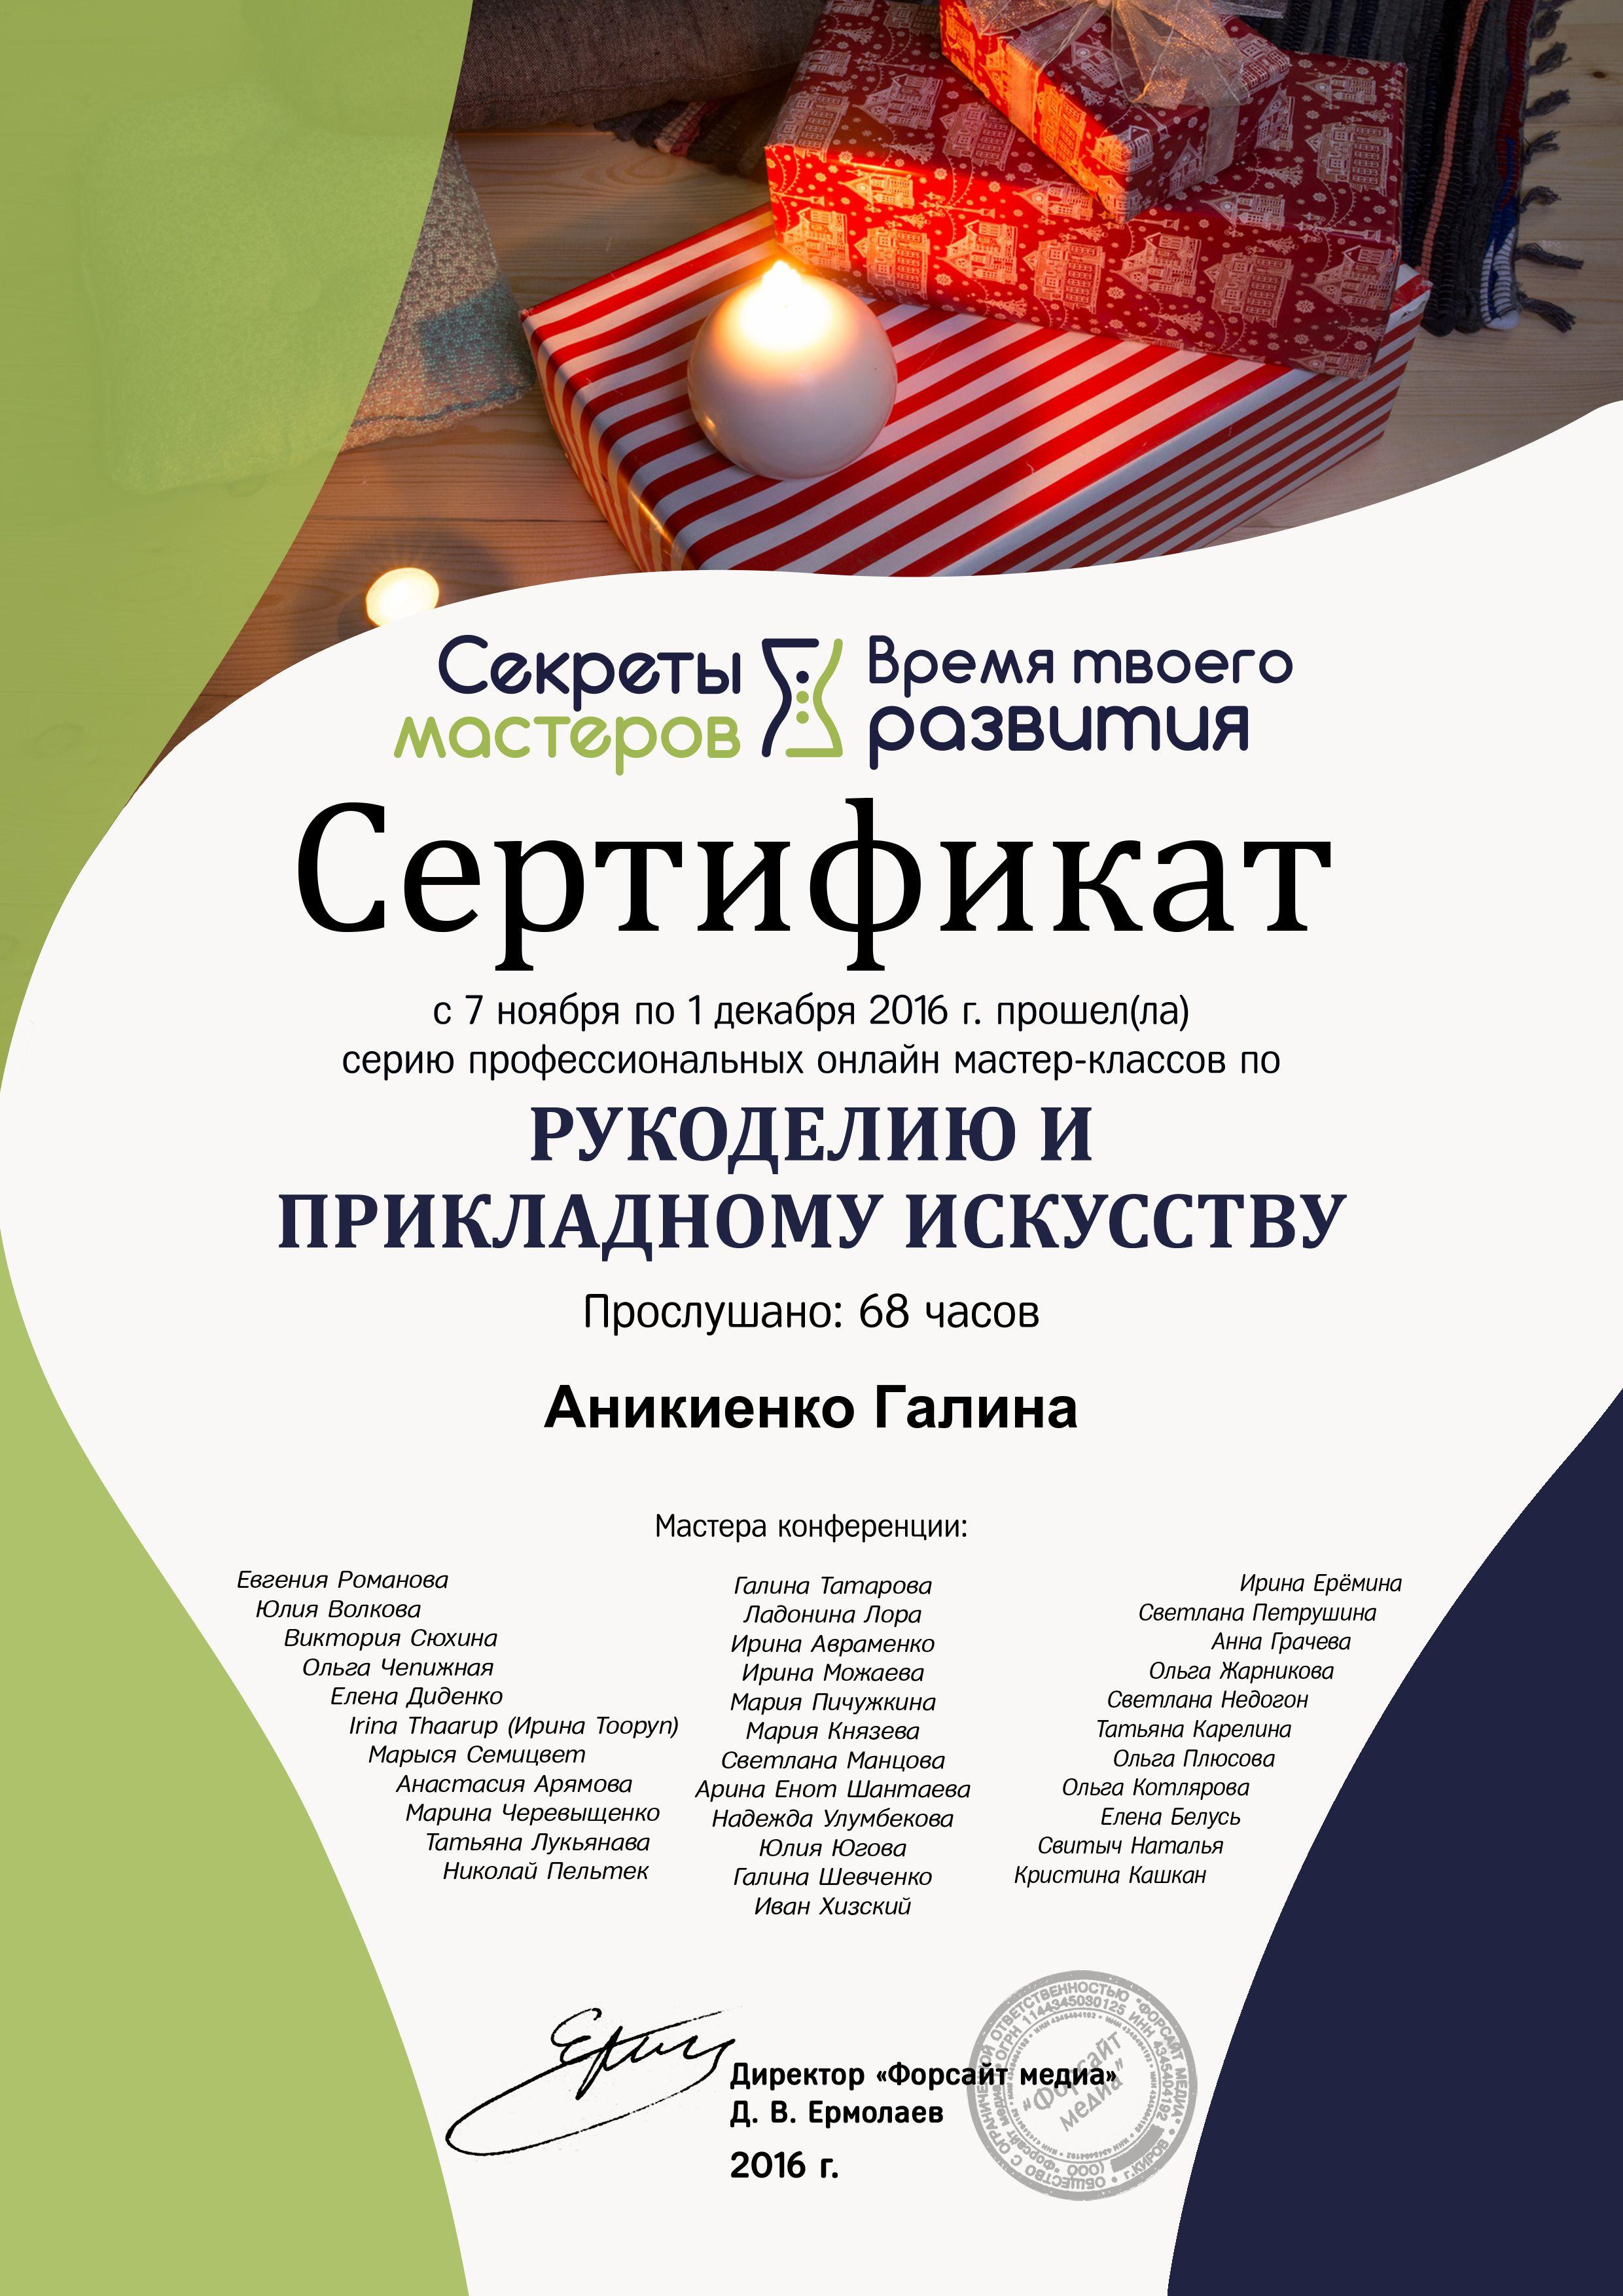 http://www.mastersecrets.ru/tmp/conferenceDiploma/conference-280523/user-3edd92d009f767f28c89289a404b7db6/diploma-125/diploma.jpeg